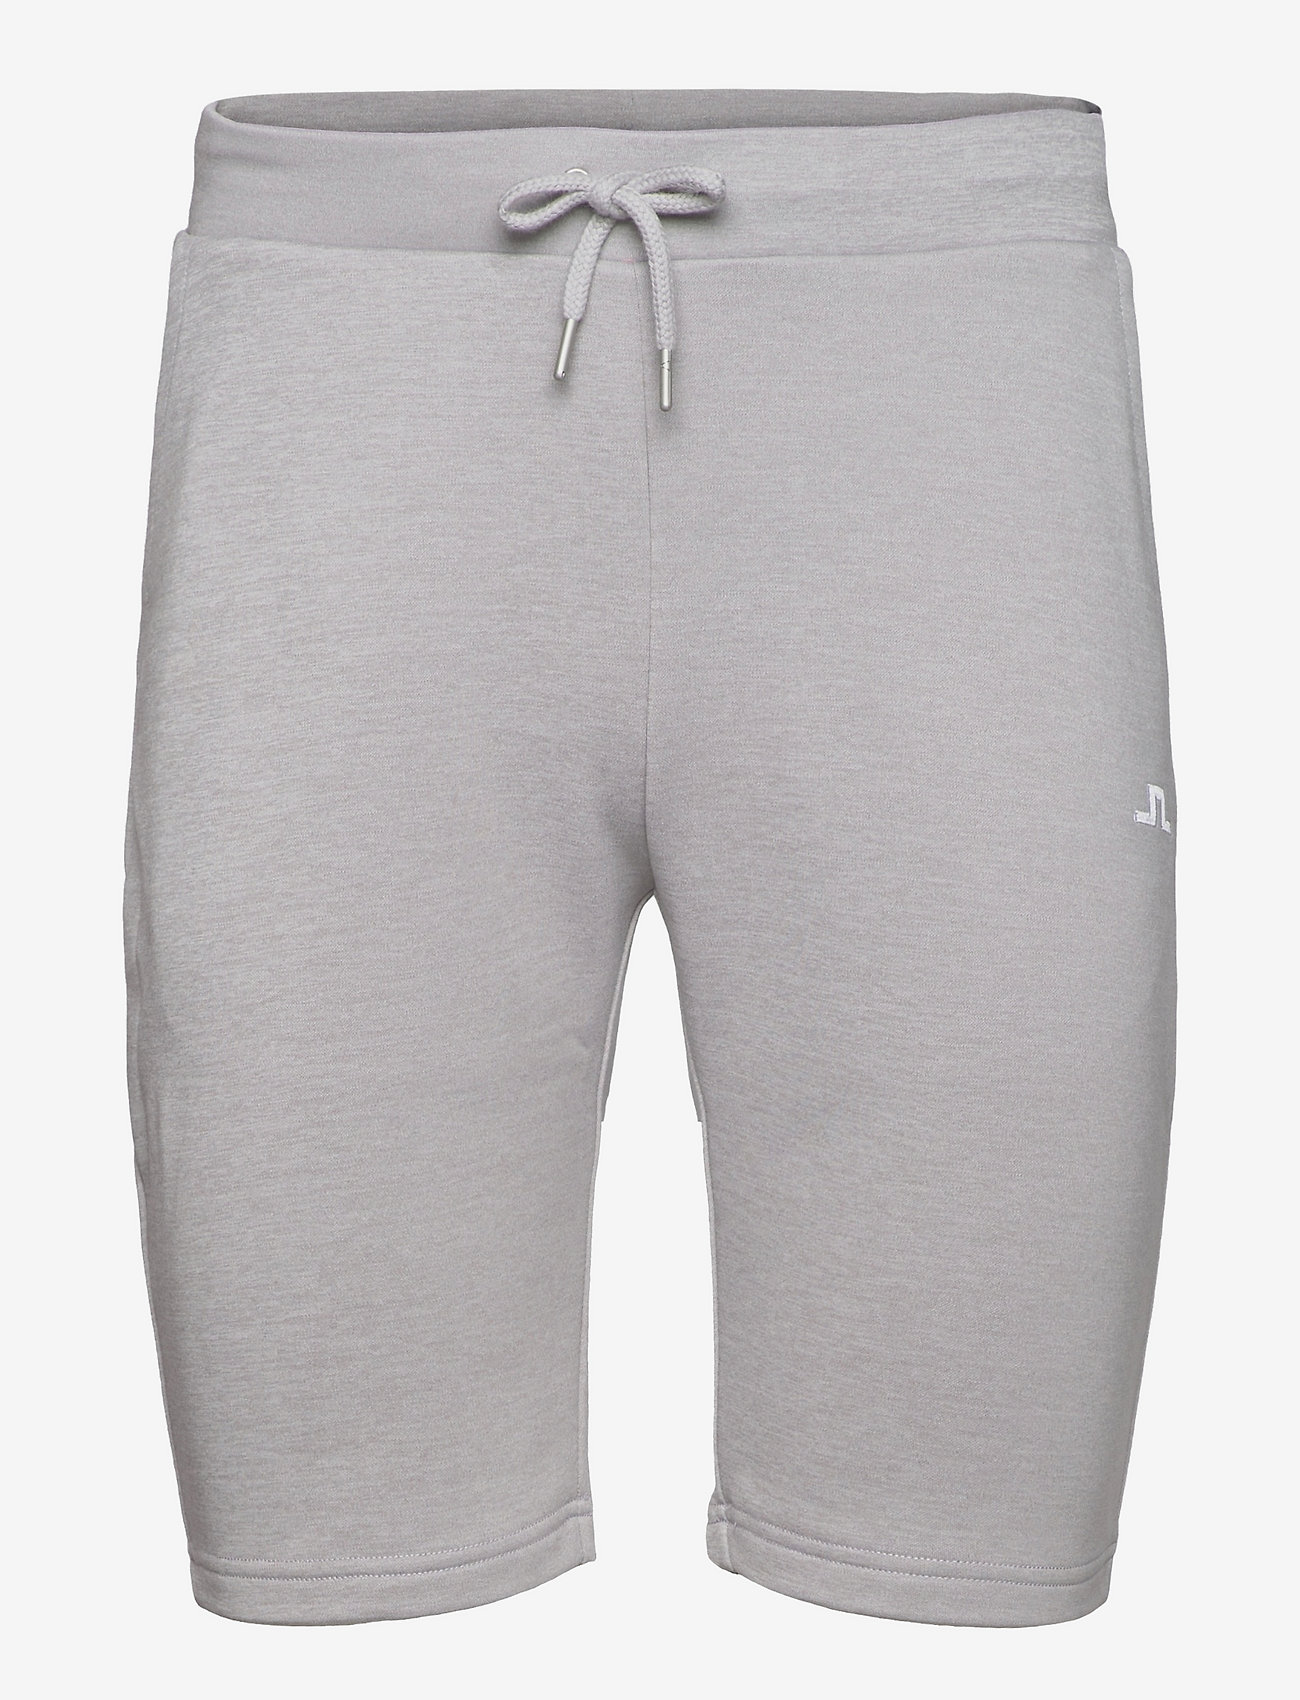 J. Lindeberg Golf - Stretch Fleece Light Shorts - golfshorts - stone grey melange - 0